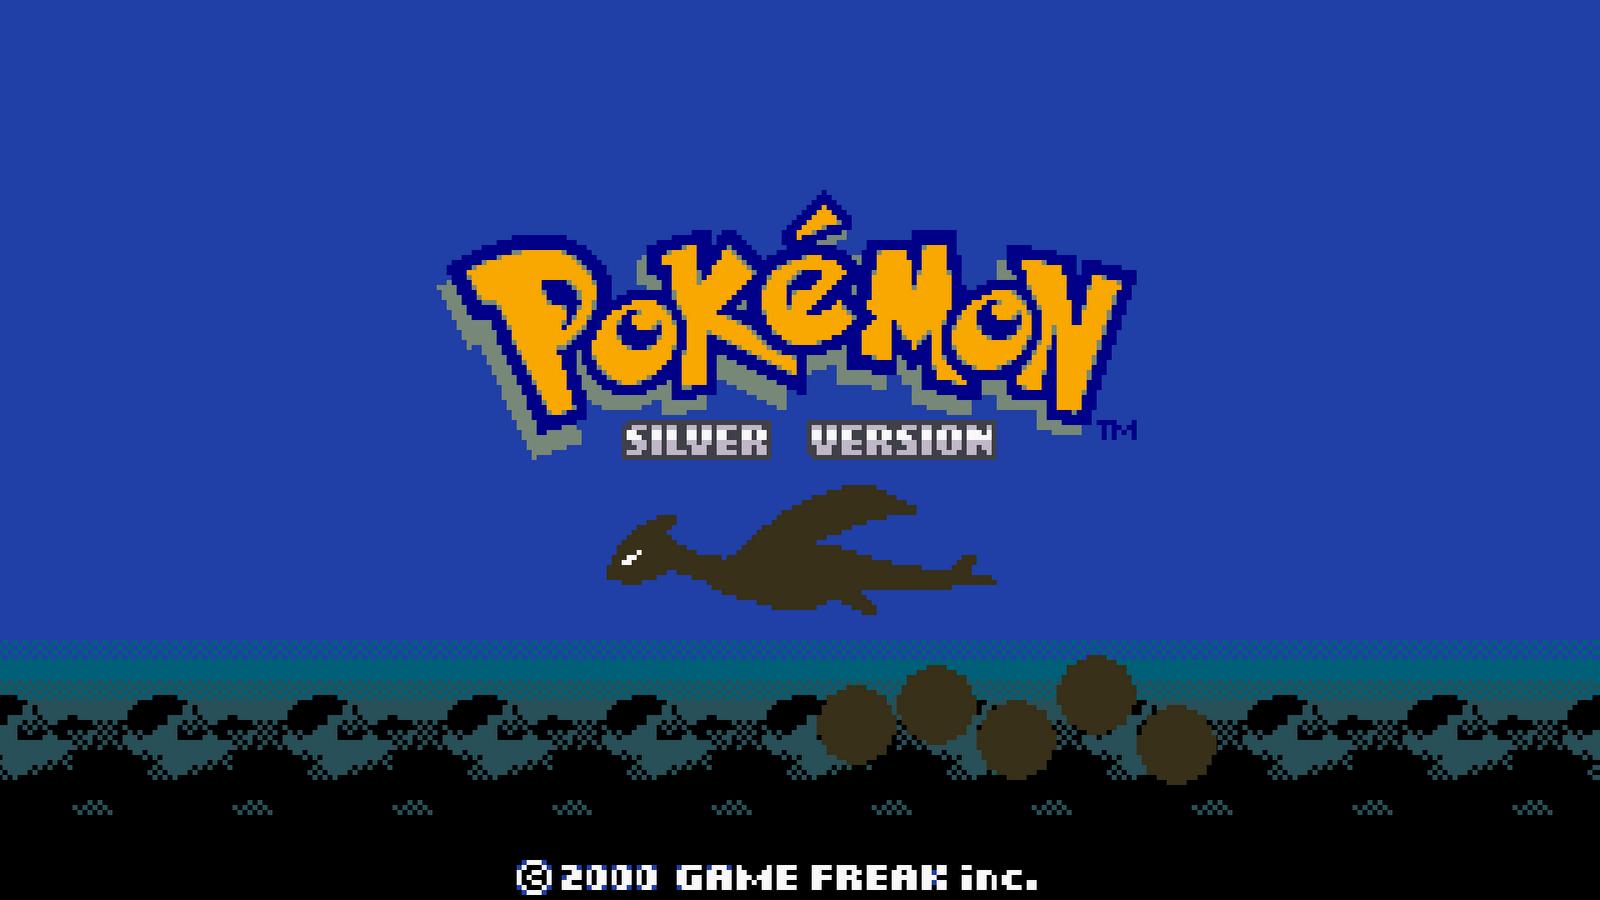 http://4.bp.blogspot.com/-HE6wqtROfIE/UF9rzNb7MpI/AAAAAAAACOw/AMgDhKdsK_I/s1600/Pokemon+Silver+8-bit+wallpaper.png